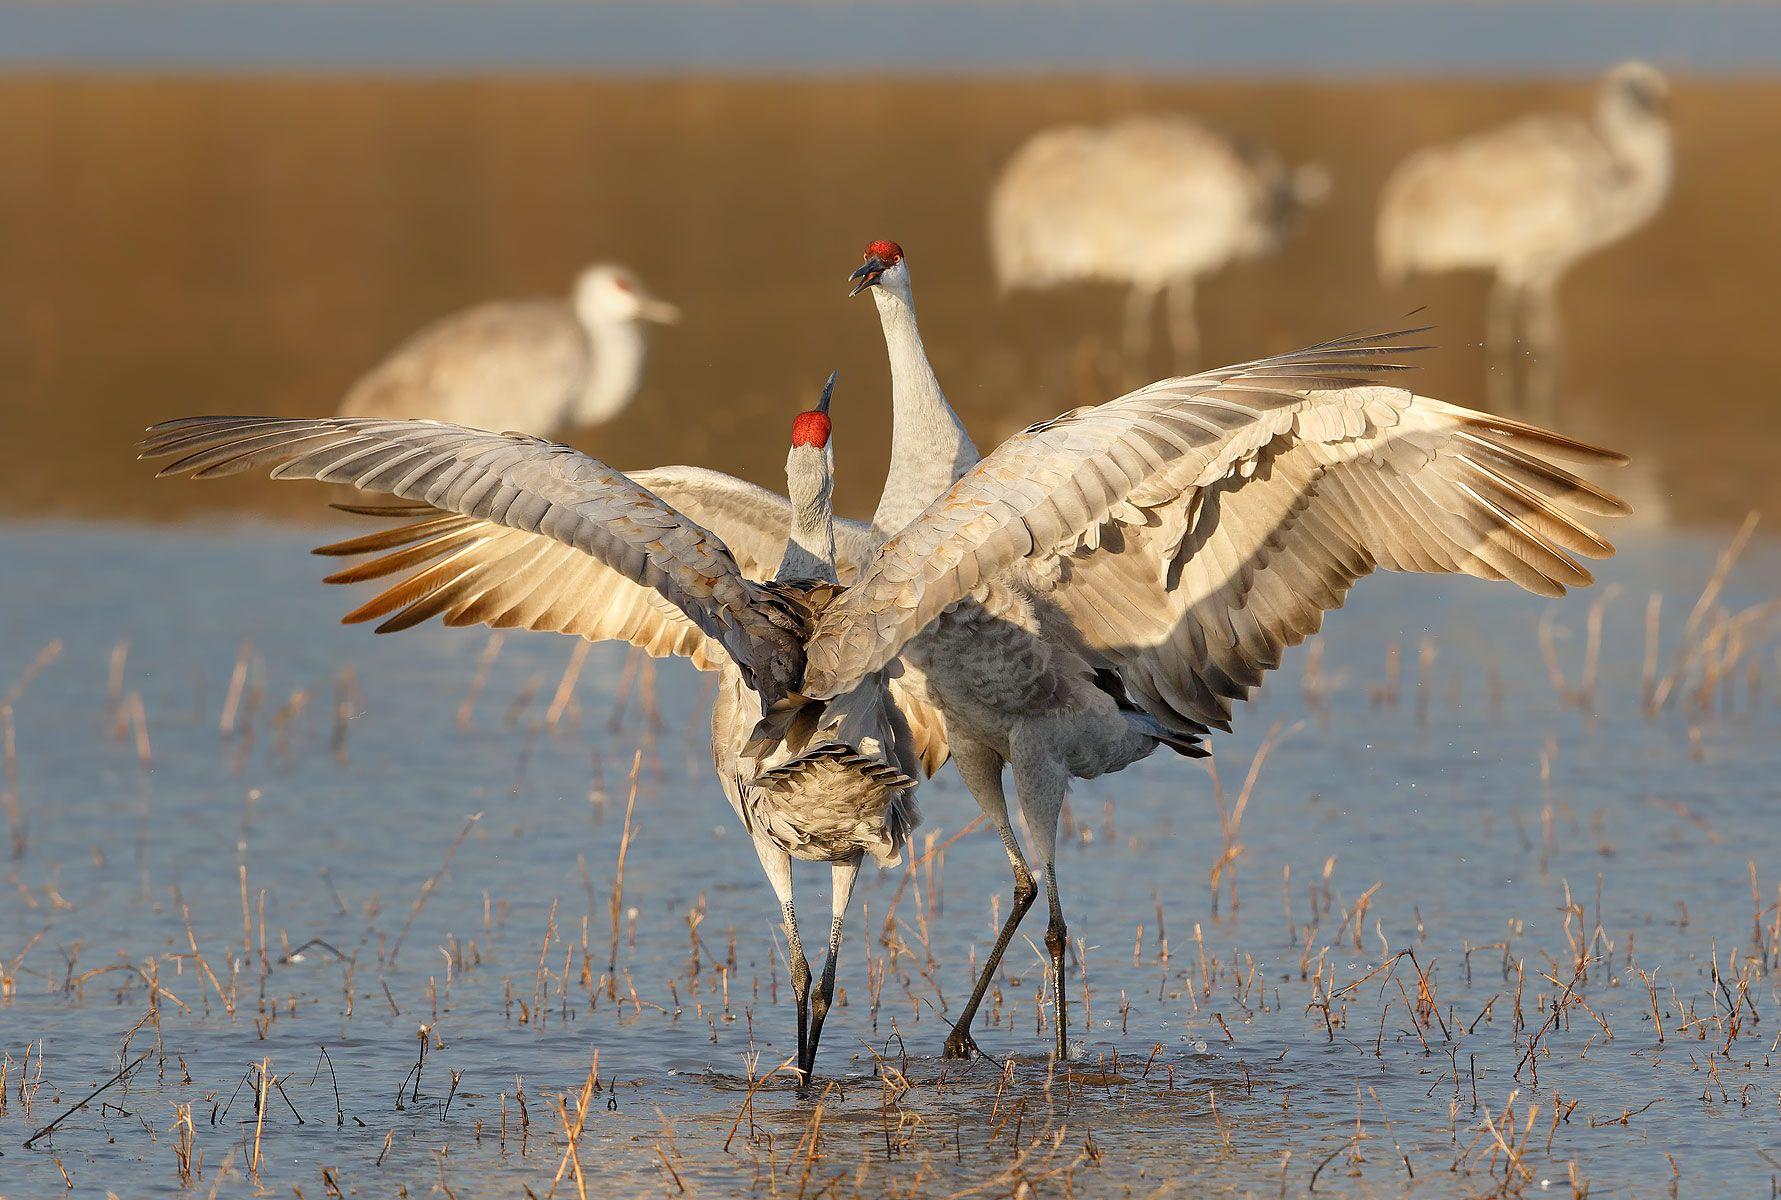 Sandhill-cranes-courting-together-II_44A2896-Bosque-del-Apache-NWR,-San-Antonio,-NM,-USA.jpg